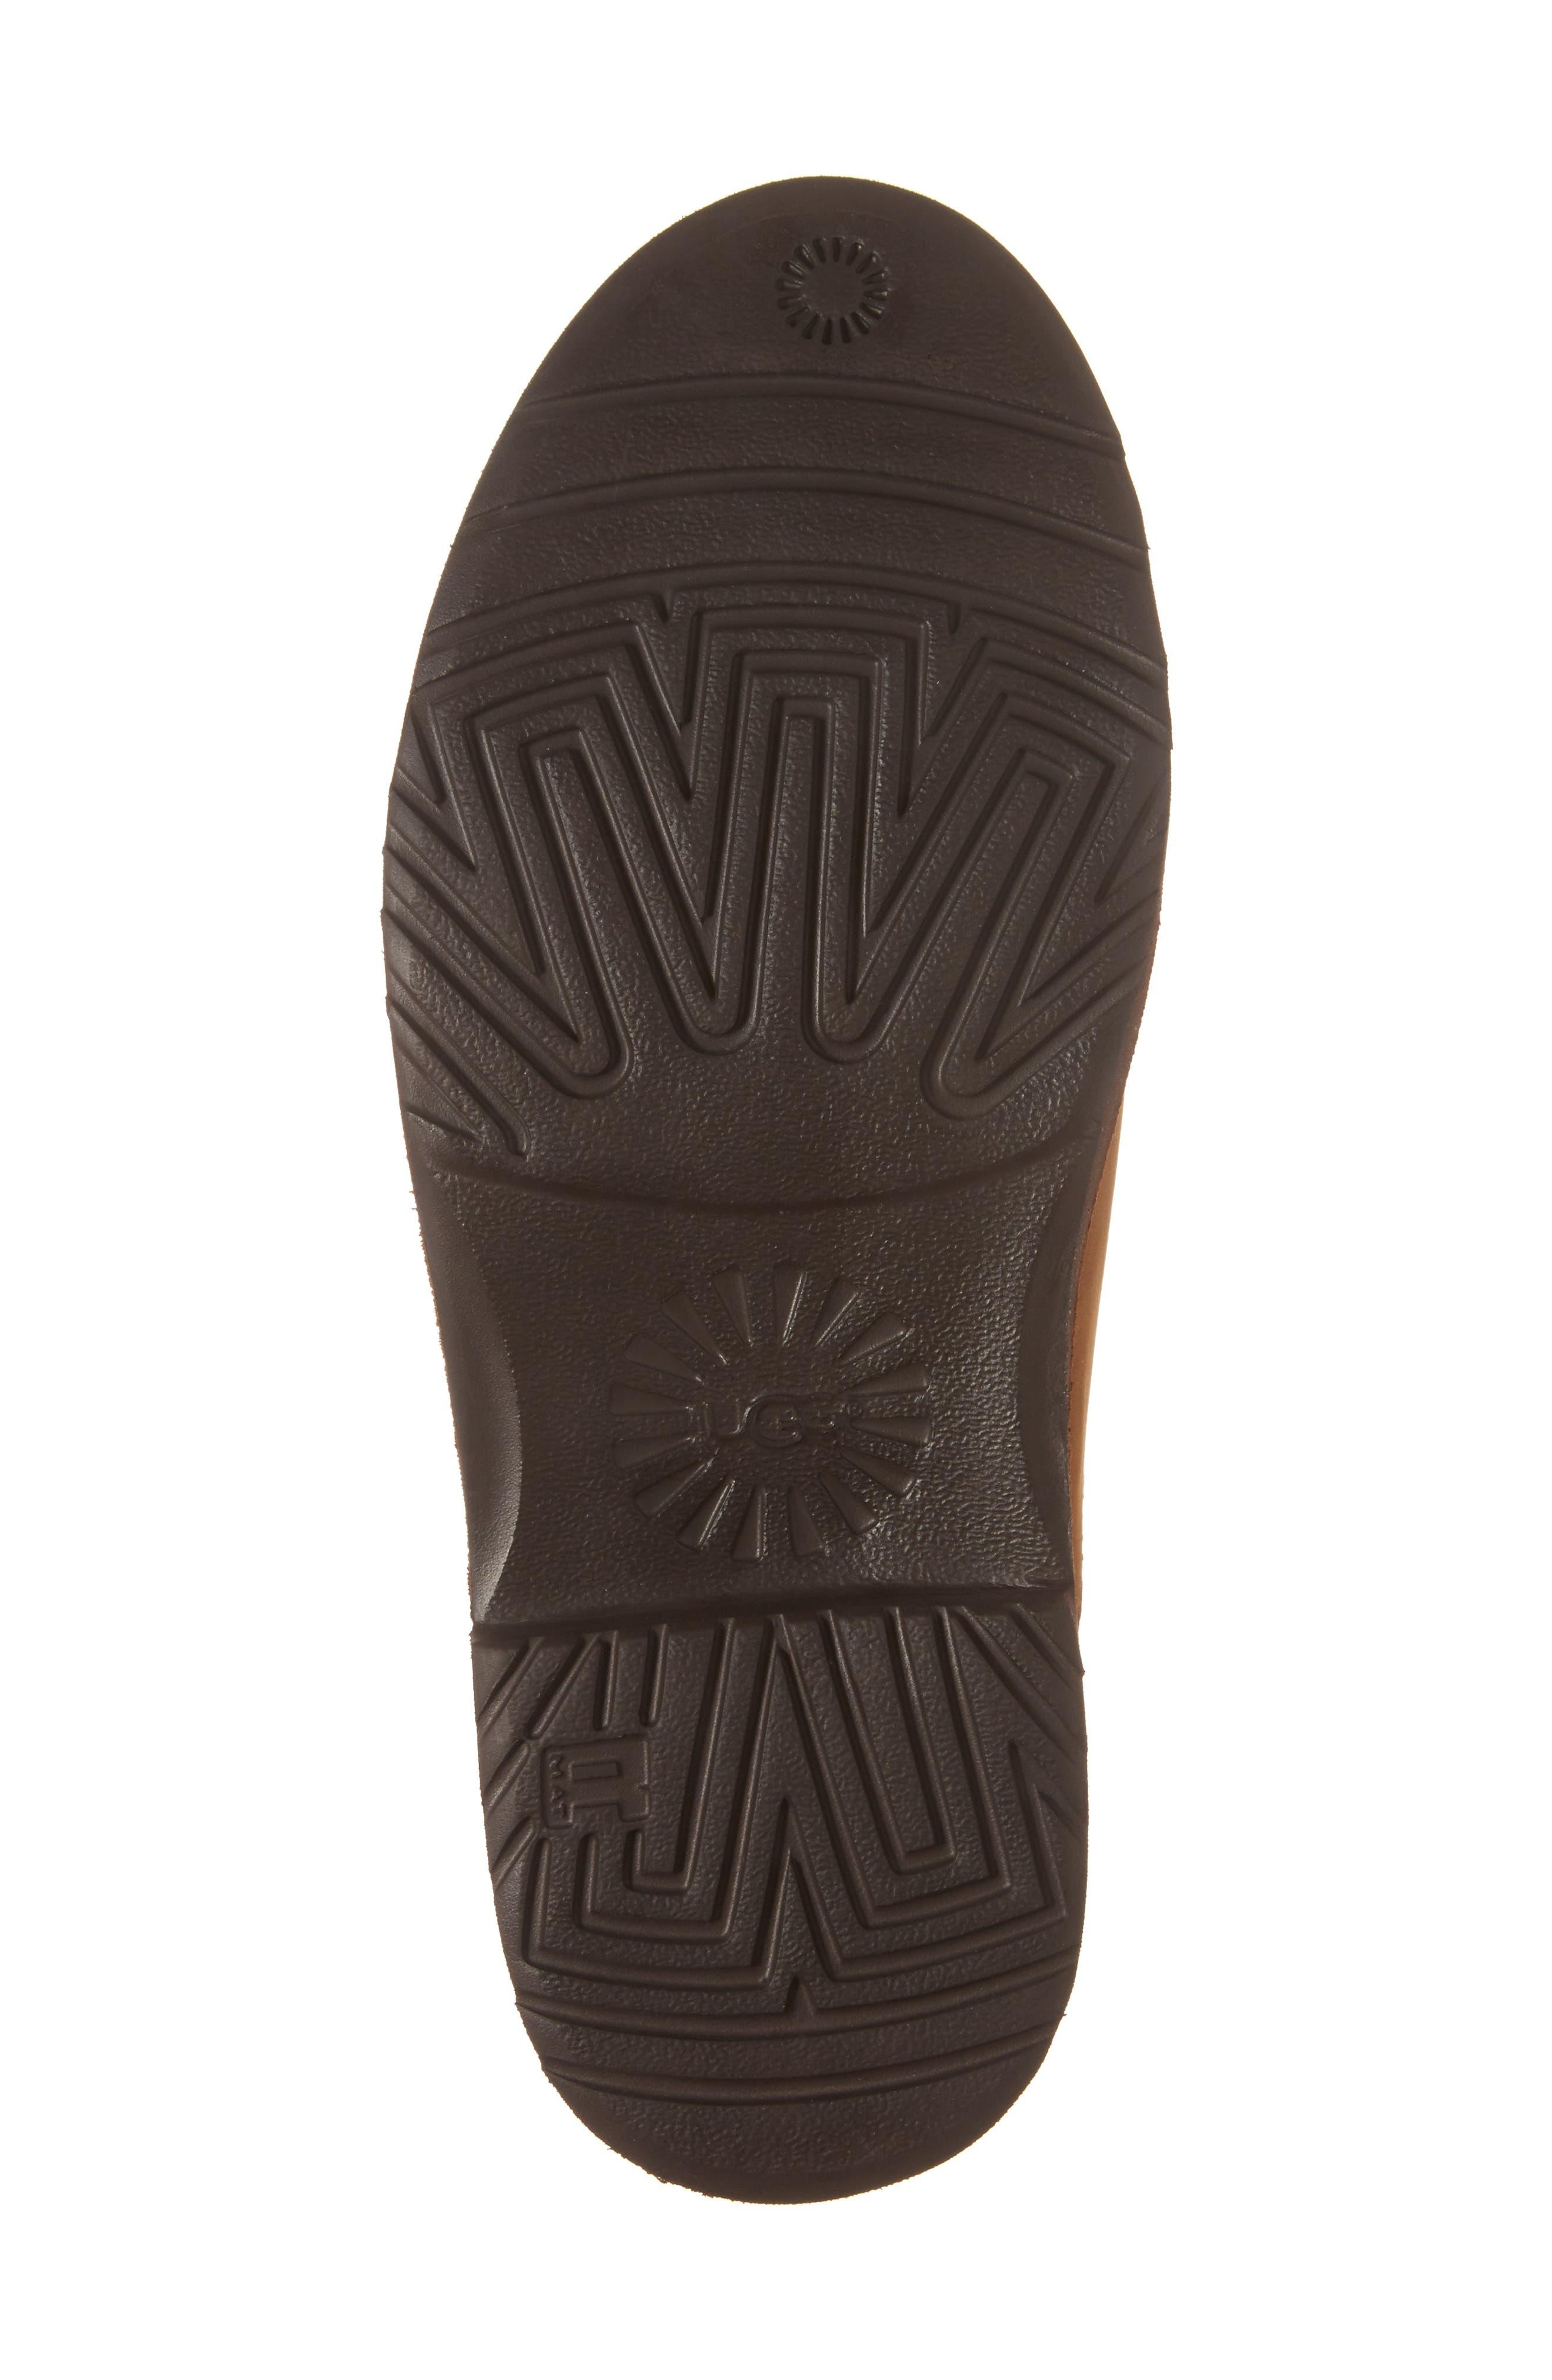 Larra Boot,                             Alternate thumbnail 6, color,                             Chestnut Nubuck Leather